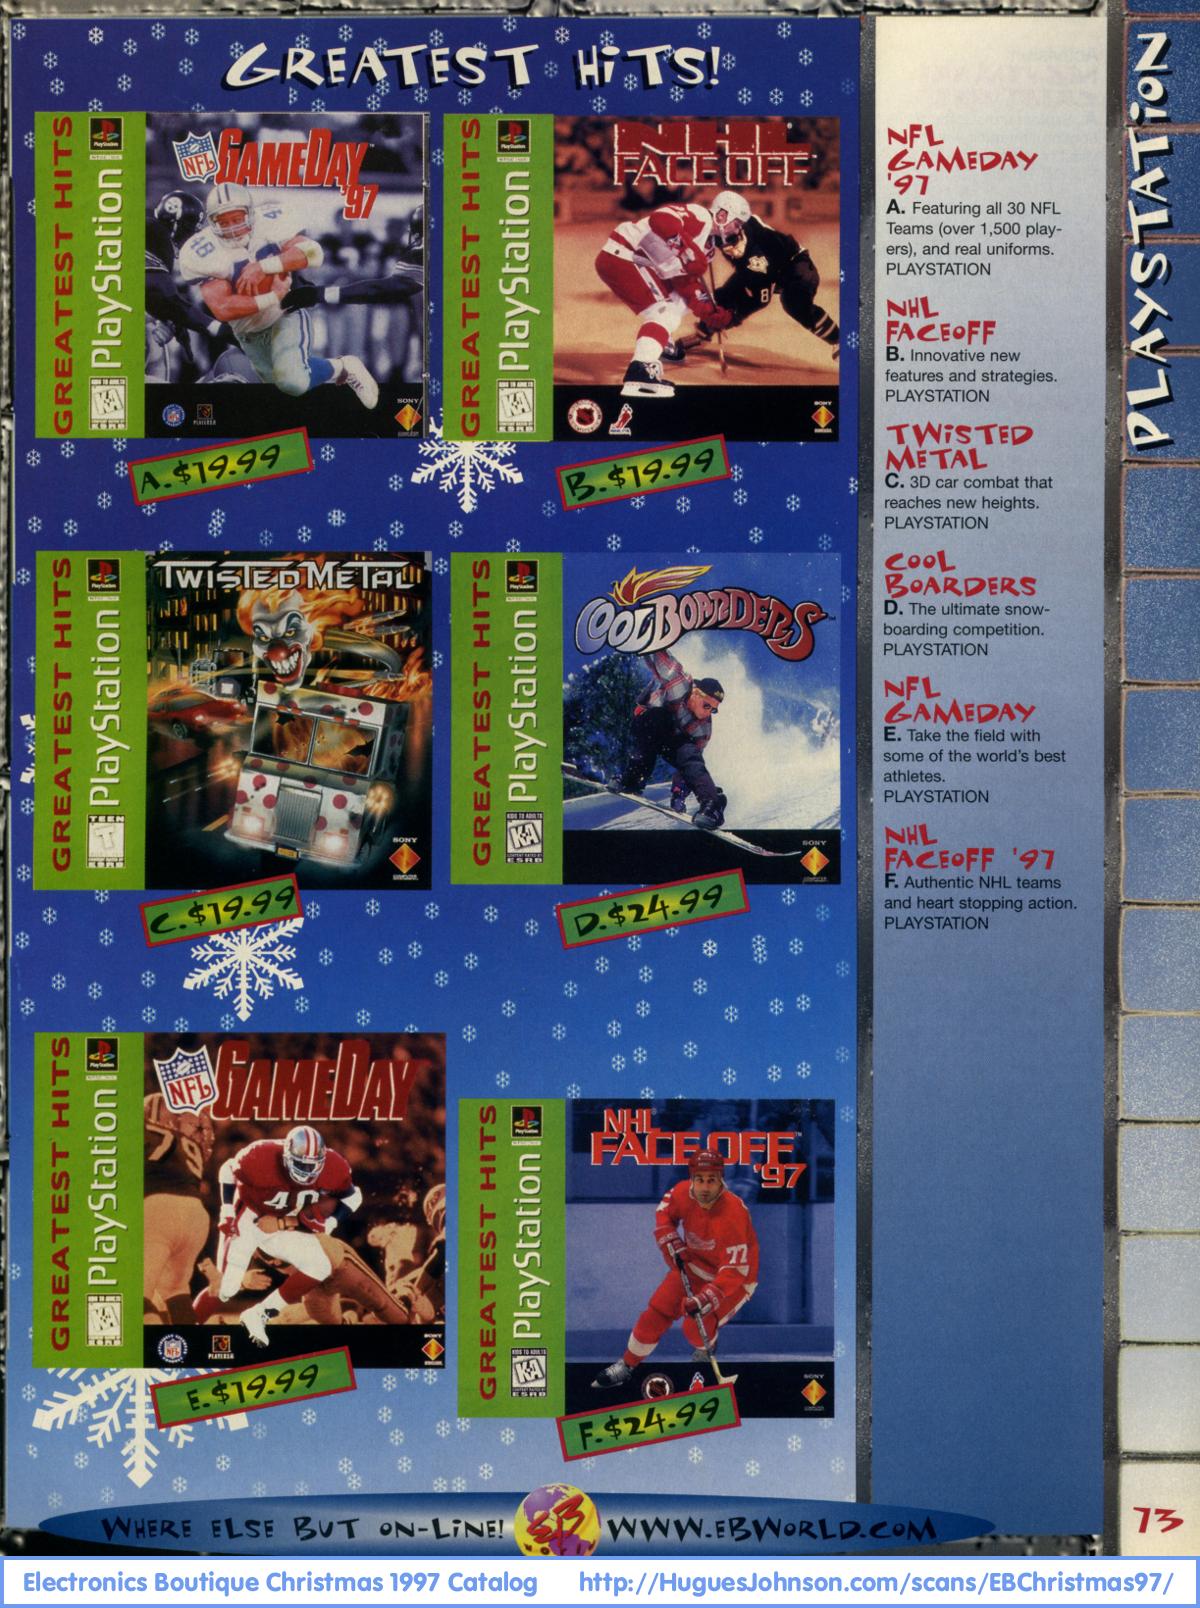 HuguesJohnson.com - Electronics Boutique Christmas 1997 ...